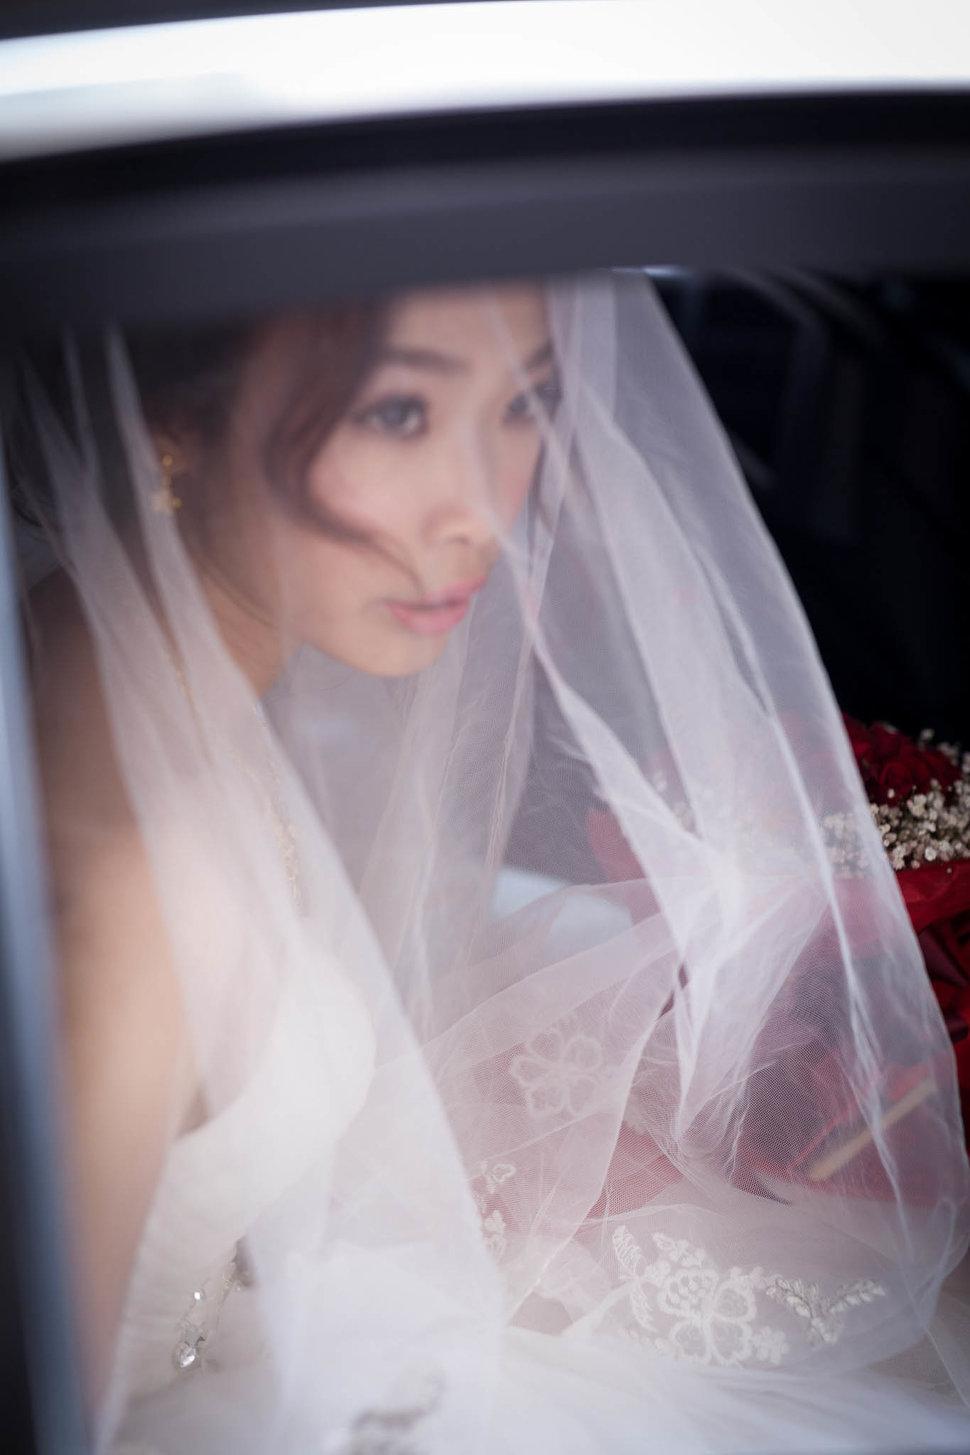 18PHOTO-丯豐❤️ 蕙君(編號:221101) - 18PHOTO 婚紗影像攝影工作室 - 結婚吧